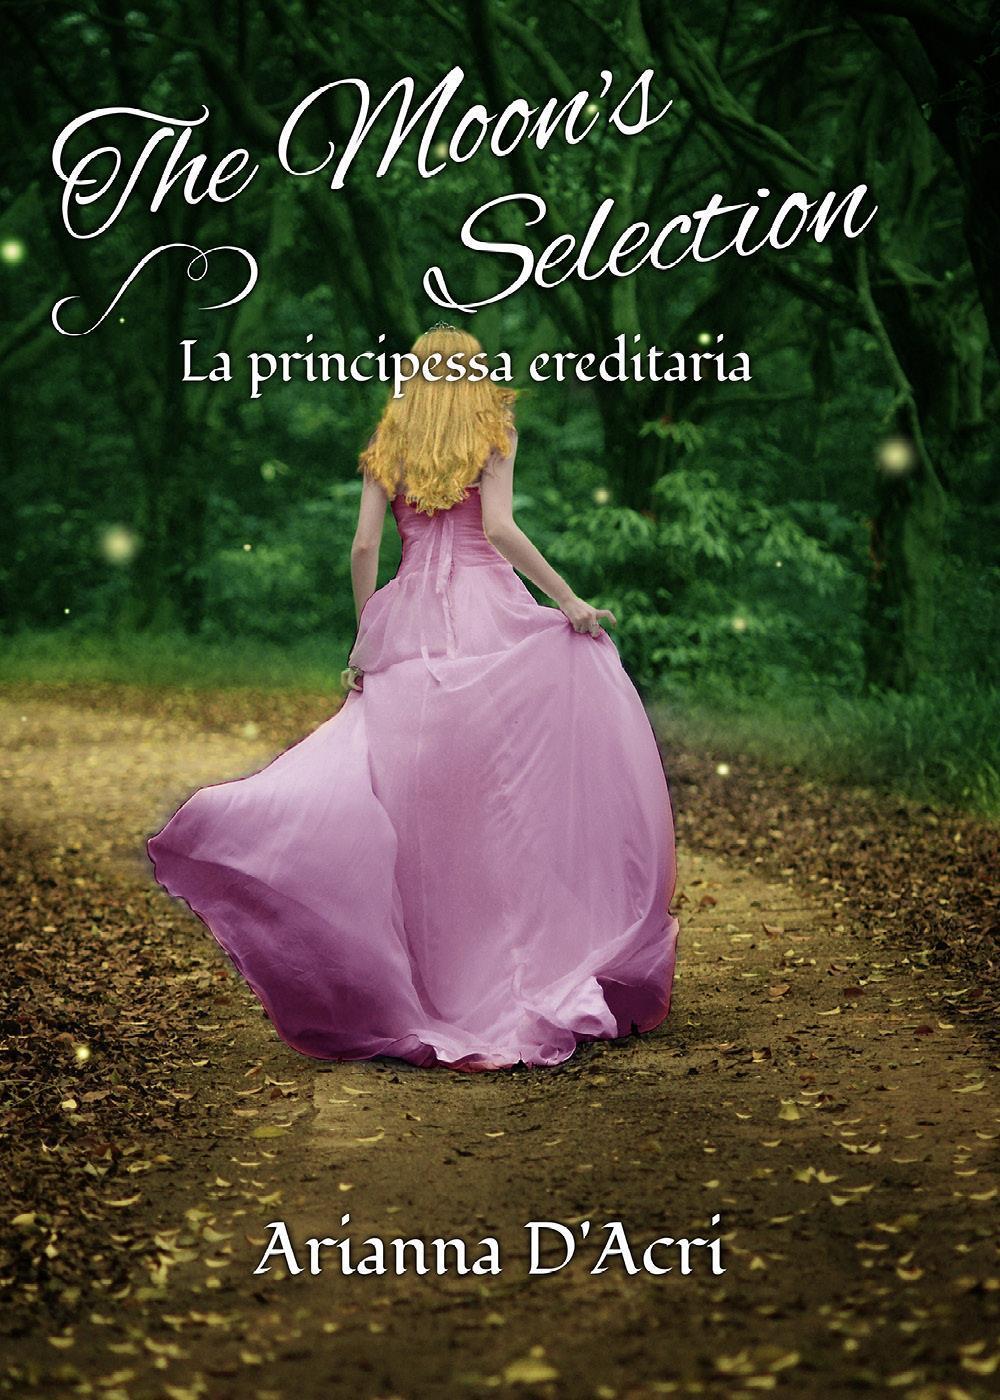 The Moon's Selection - La principessa ereditaria